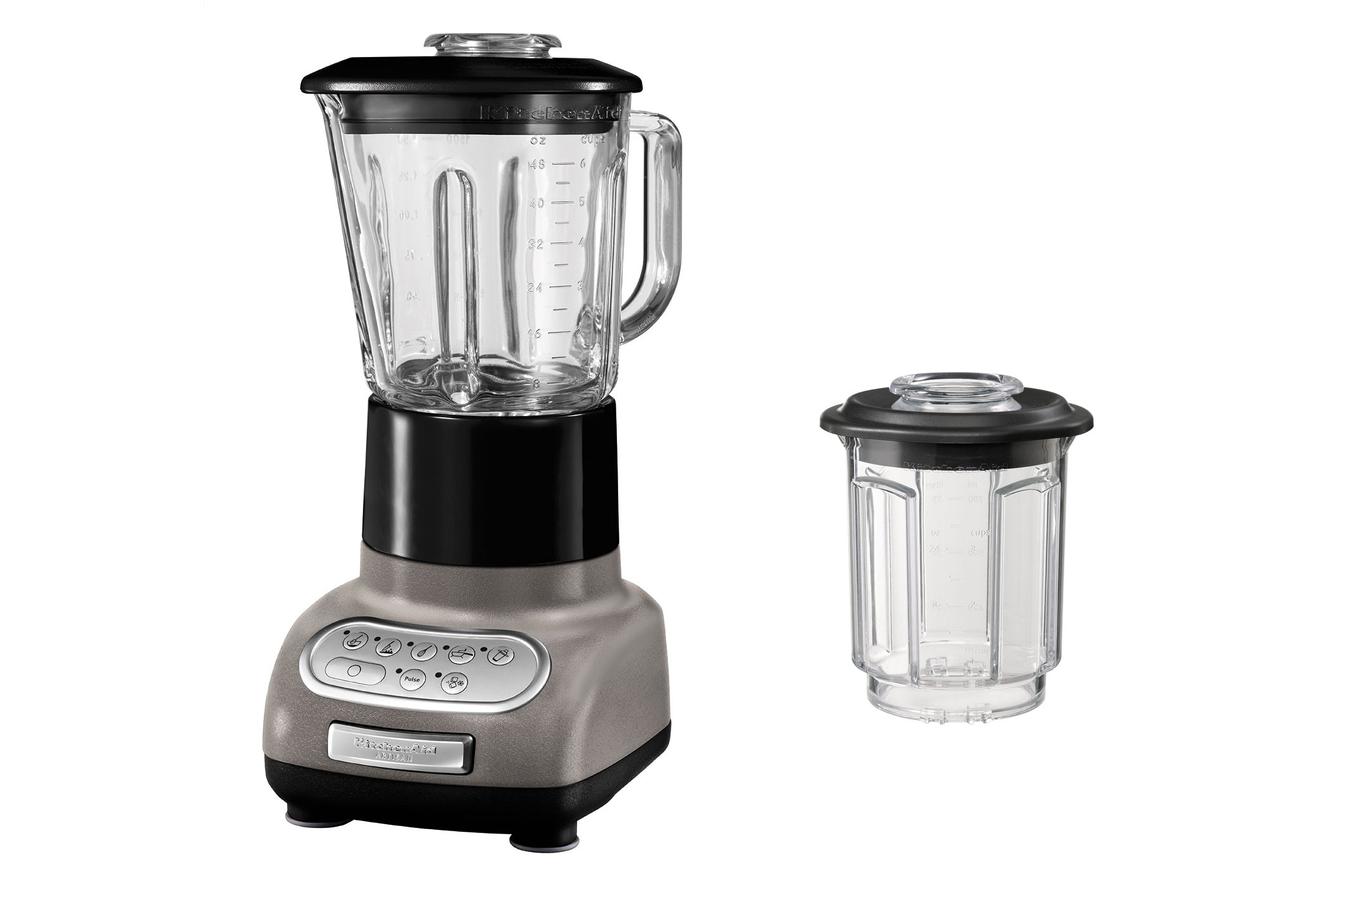 nav achat petit electromenager preparation culinaire bol mixeur blender kitchenaid ksbems gris etain